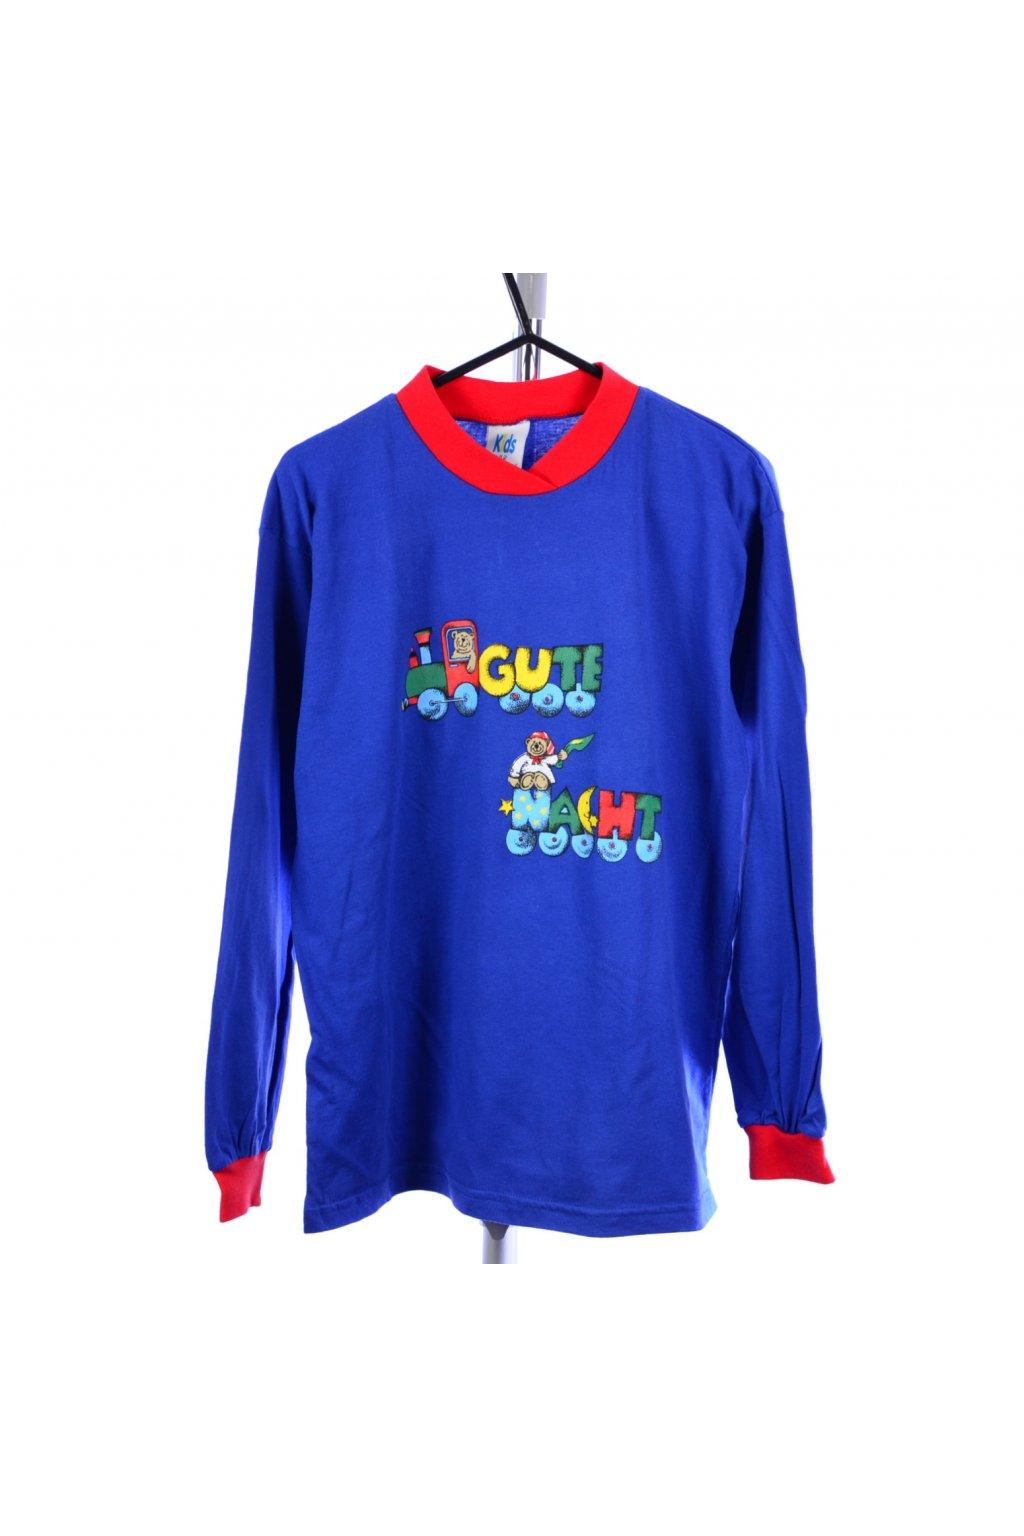 Tričko Kids modré vel. 152